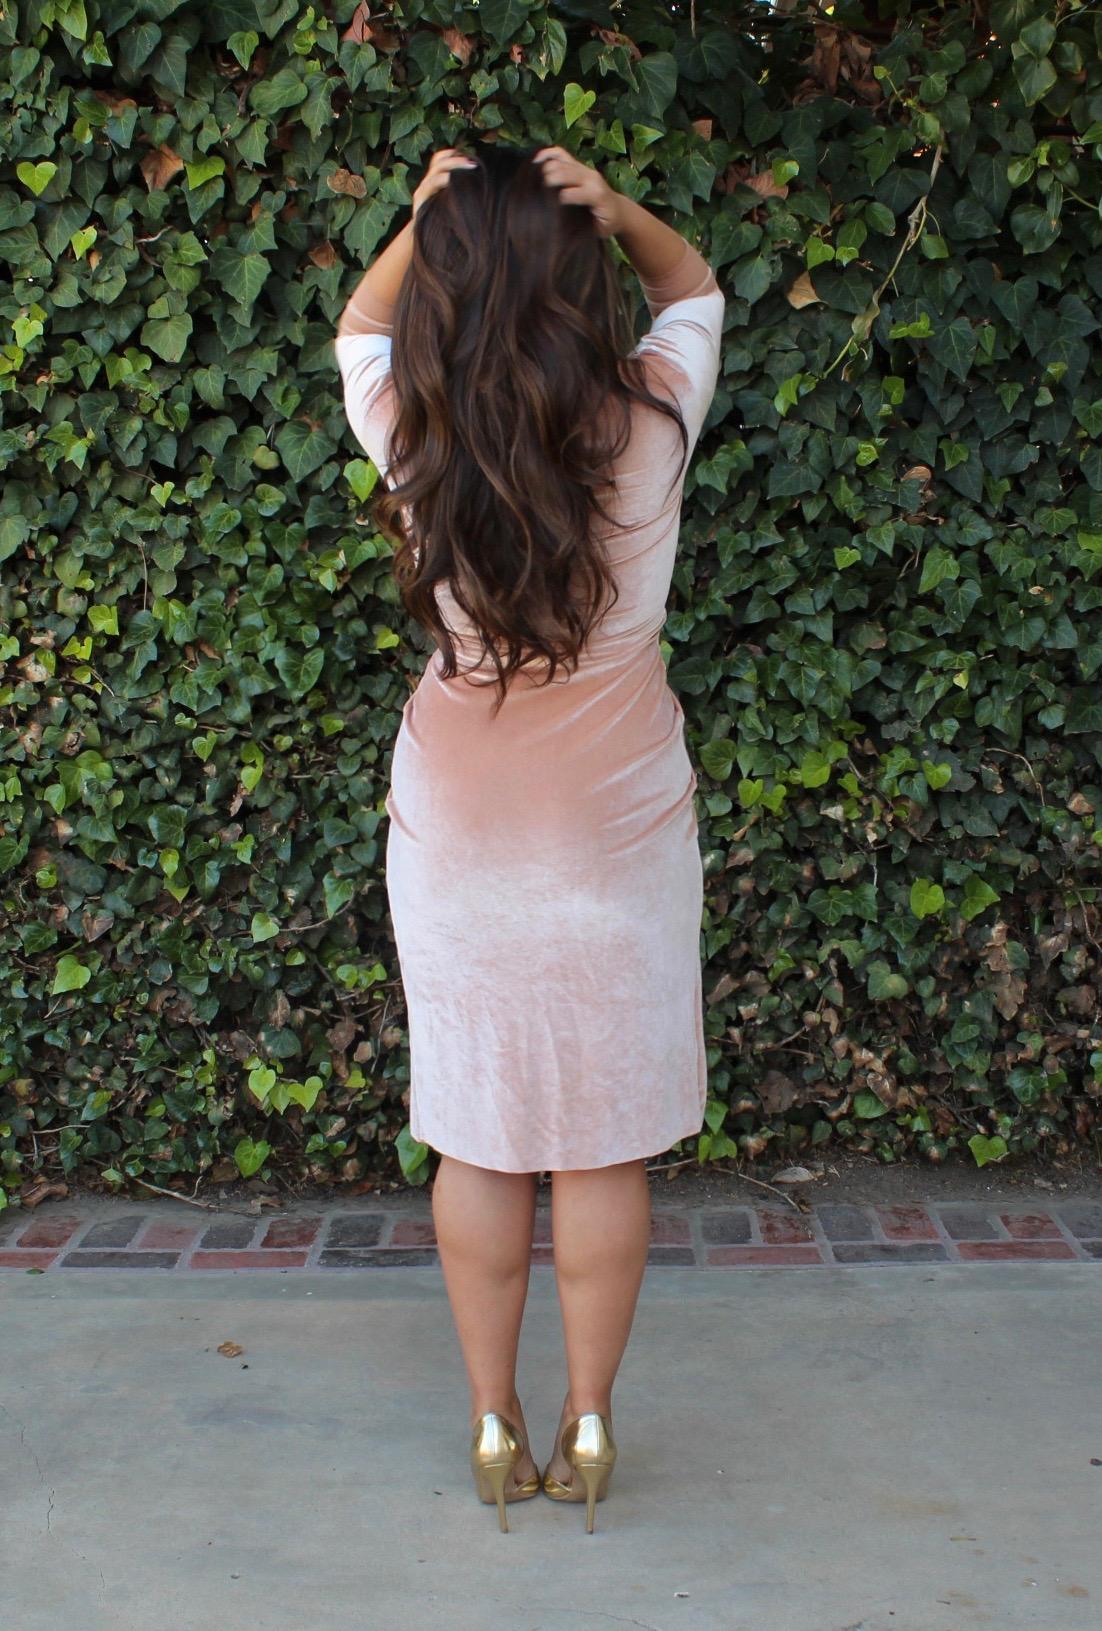 tia-wong-pink-velvet-dress